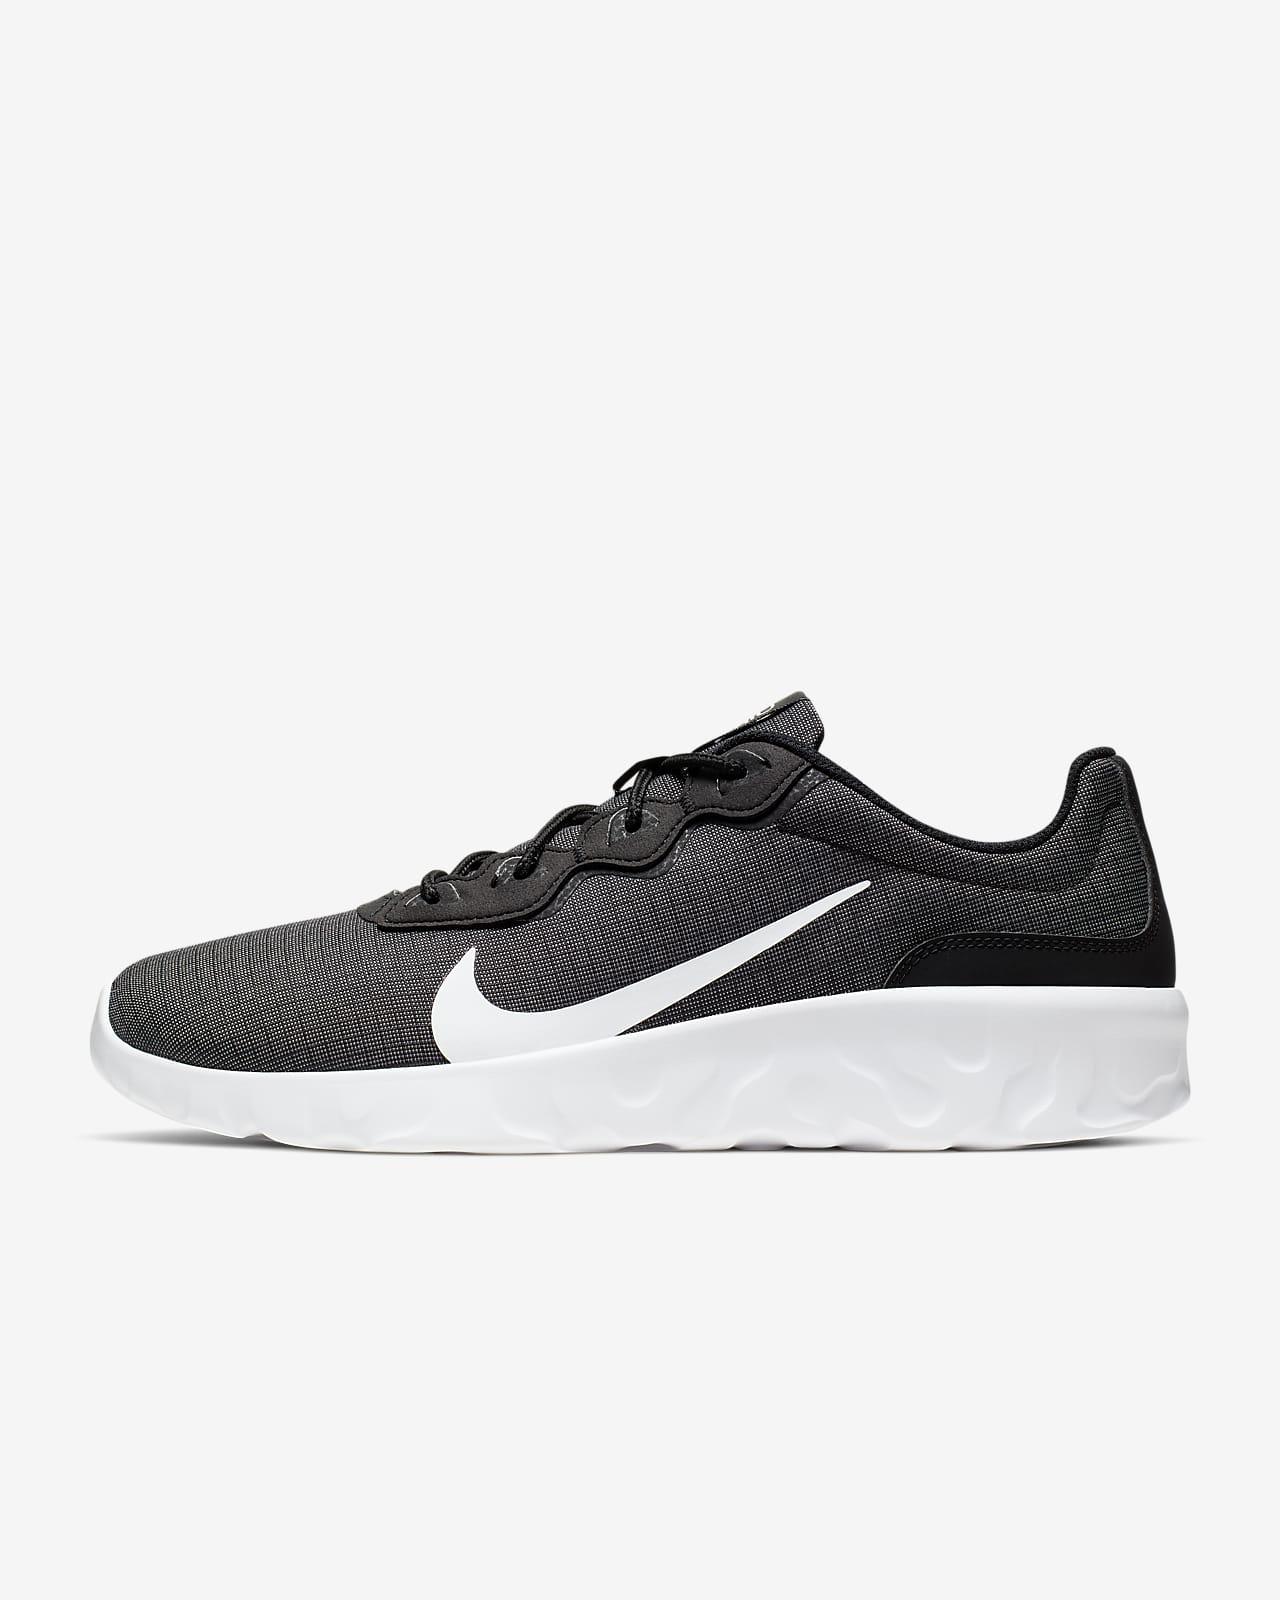 Chausure Nike Explore Strada pour Homme